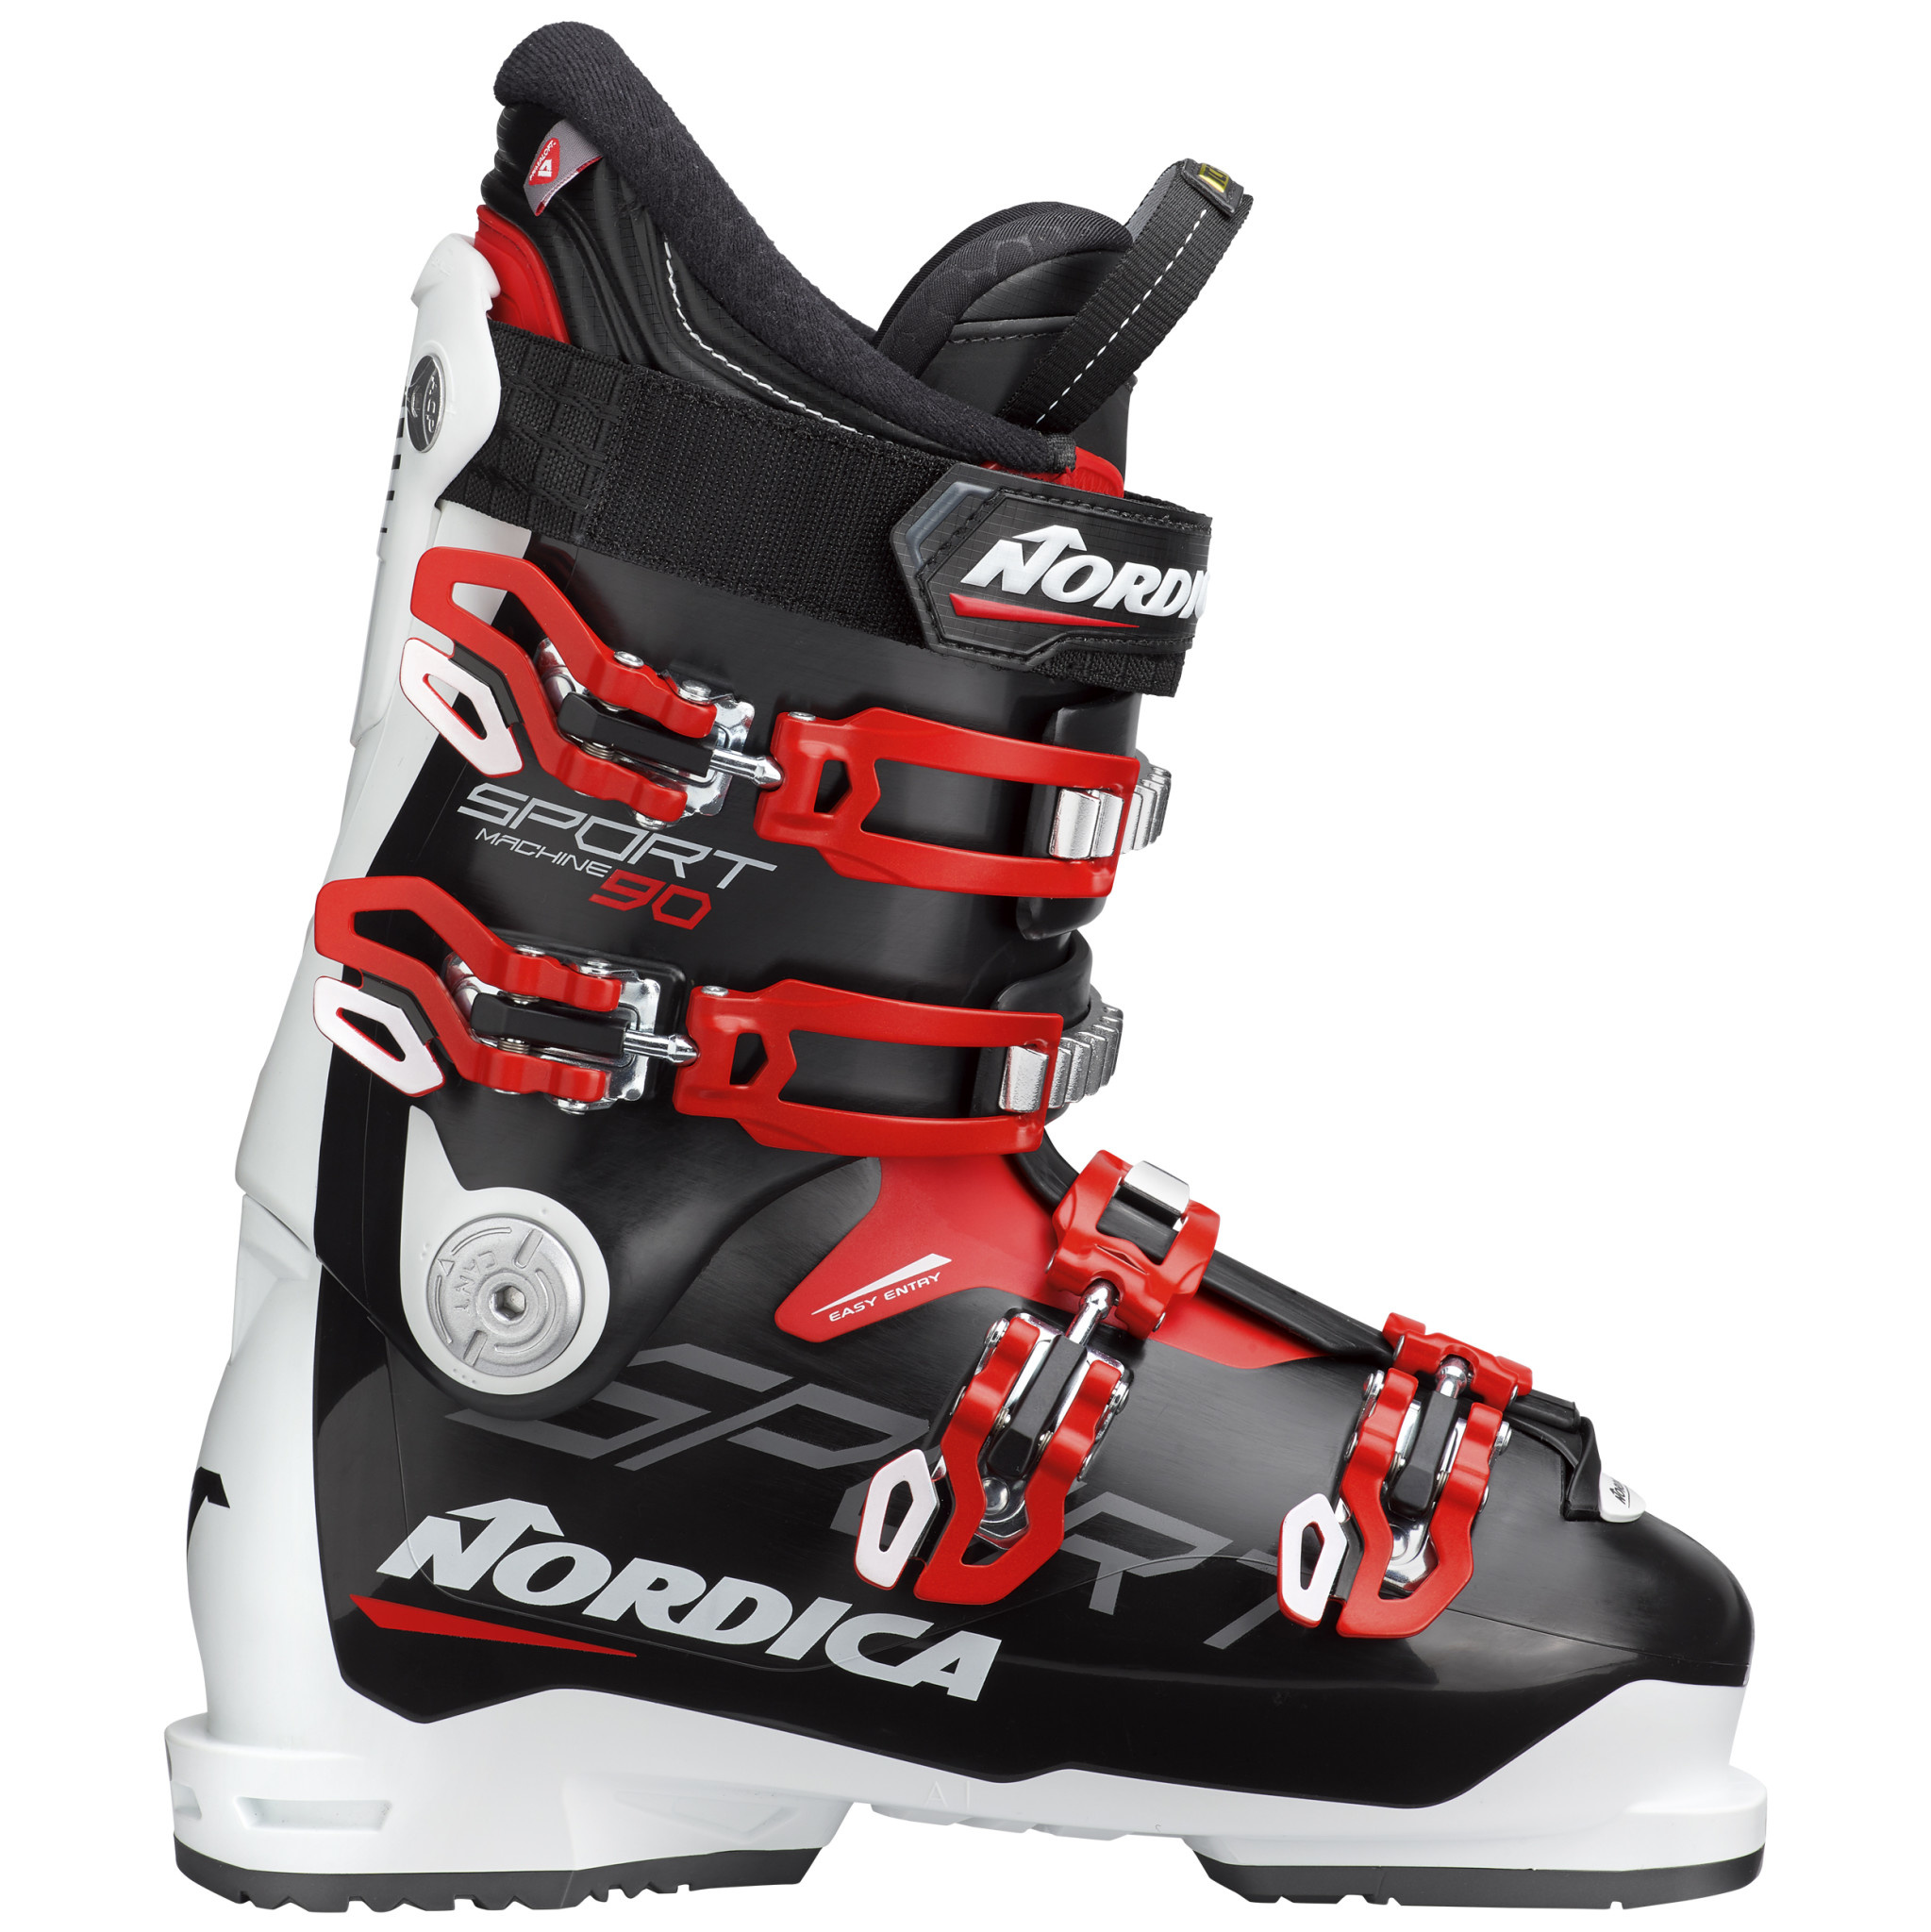 NORDICA Sportmachine 90 Ski Boot 2020